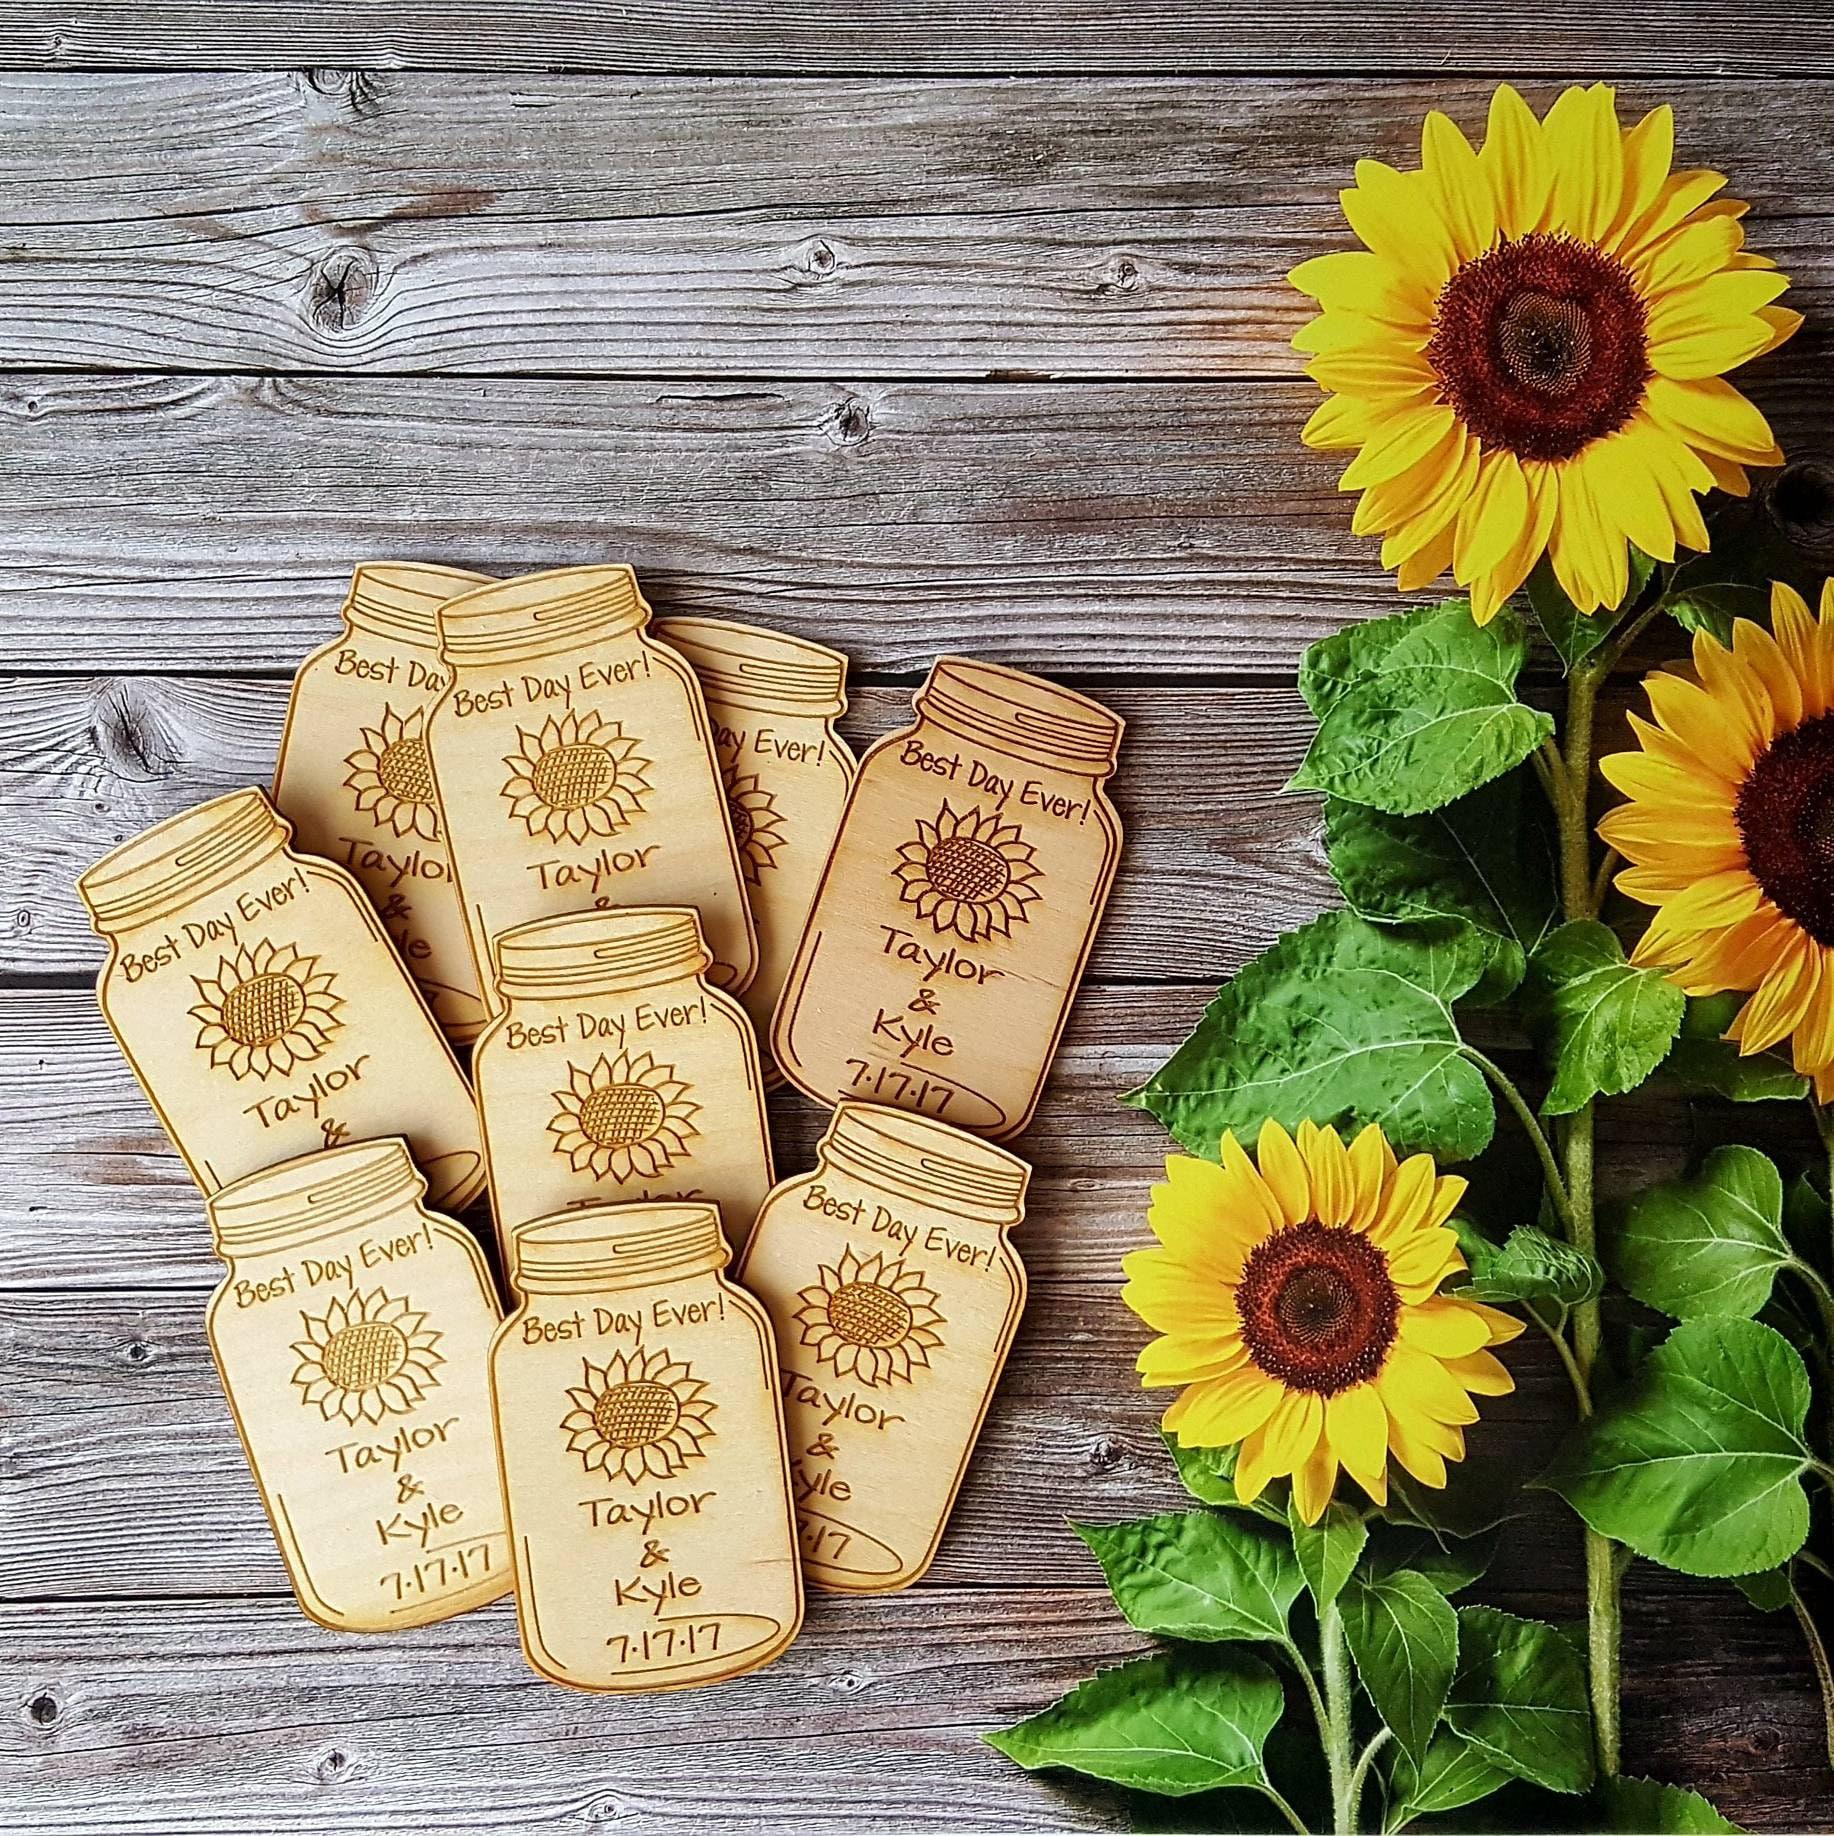 Flowers In Jars Wedding: Wedding Favor Mason Jar With Sunflower Wedding Favor